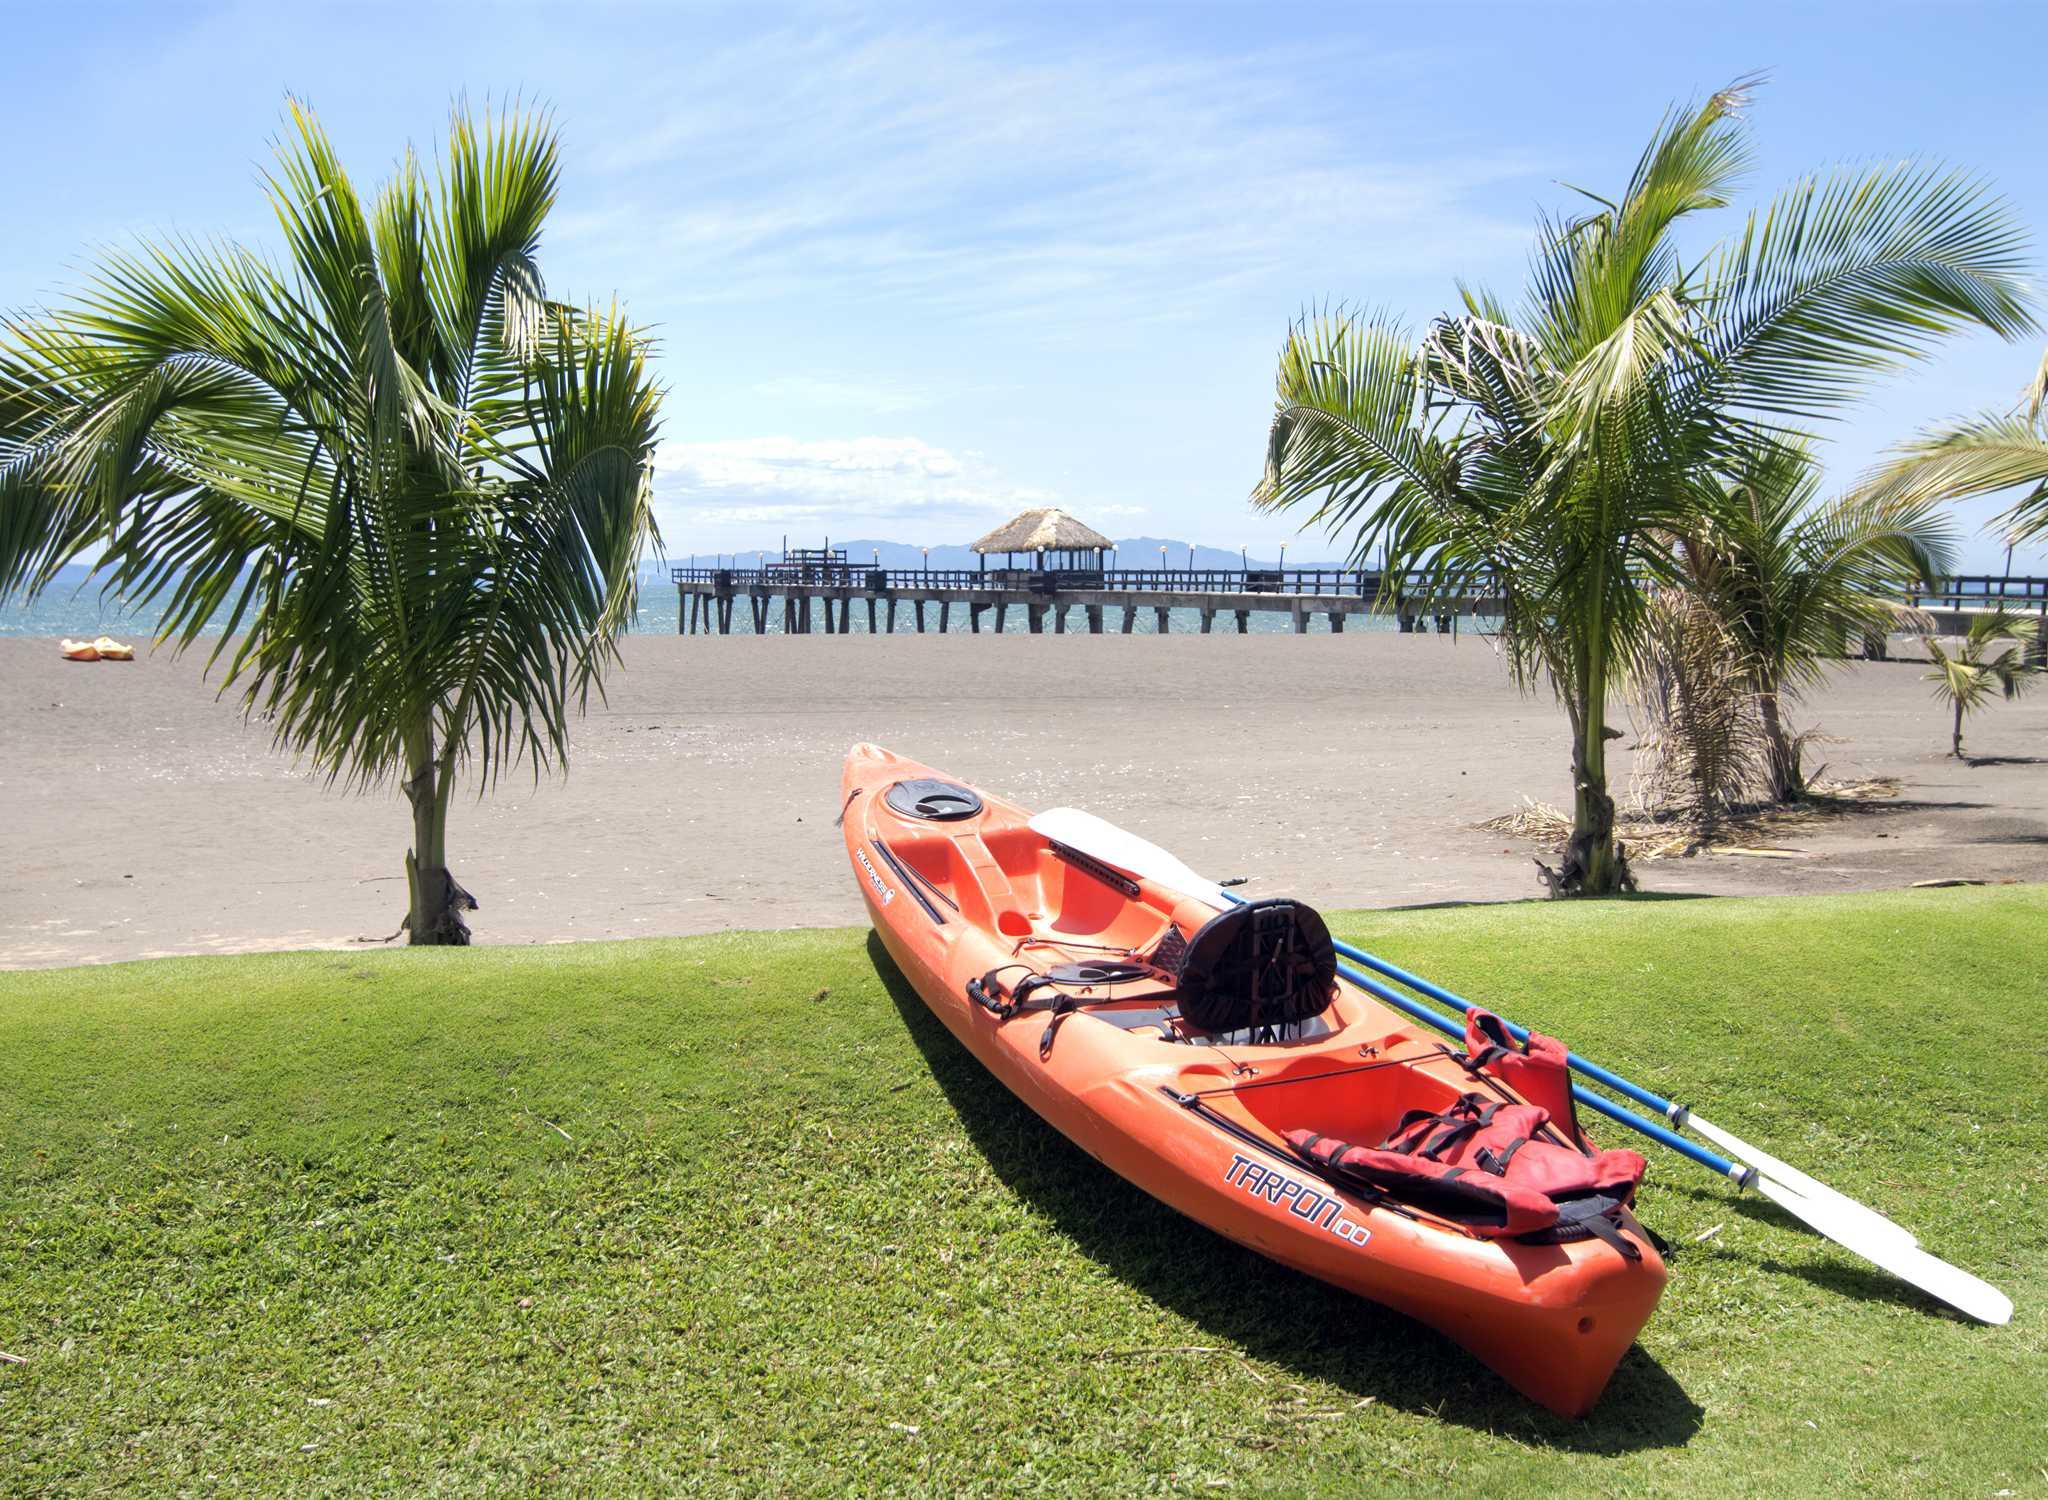 Hilton Hotels & Resorts - Costa Rica